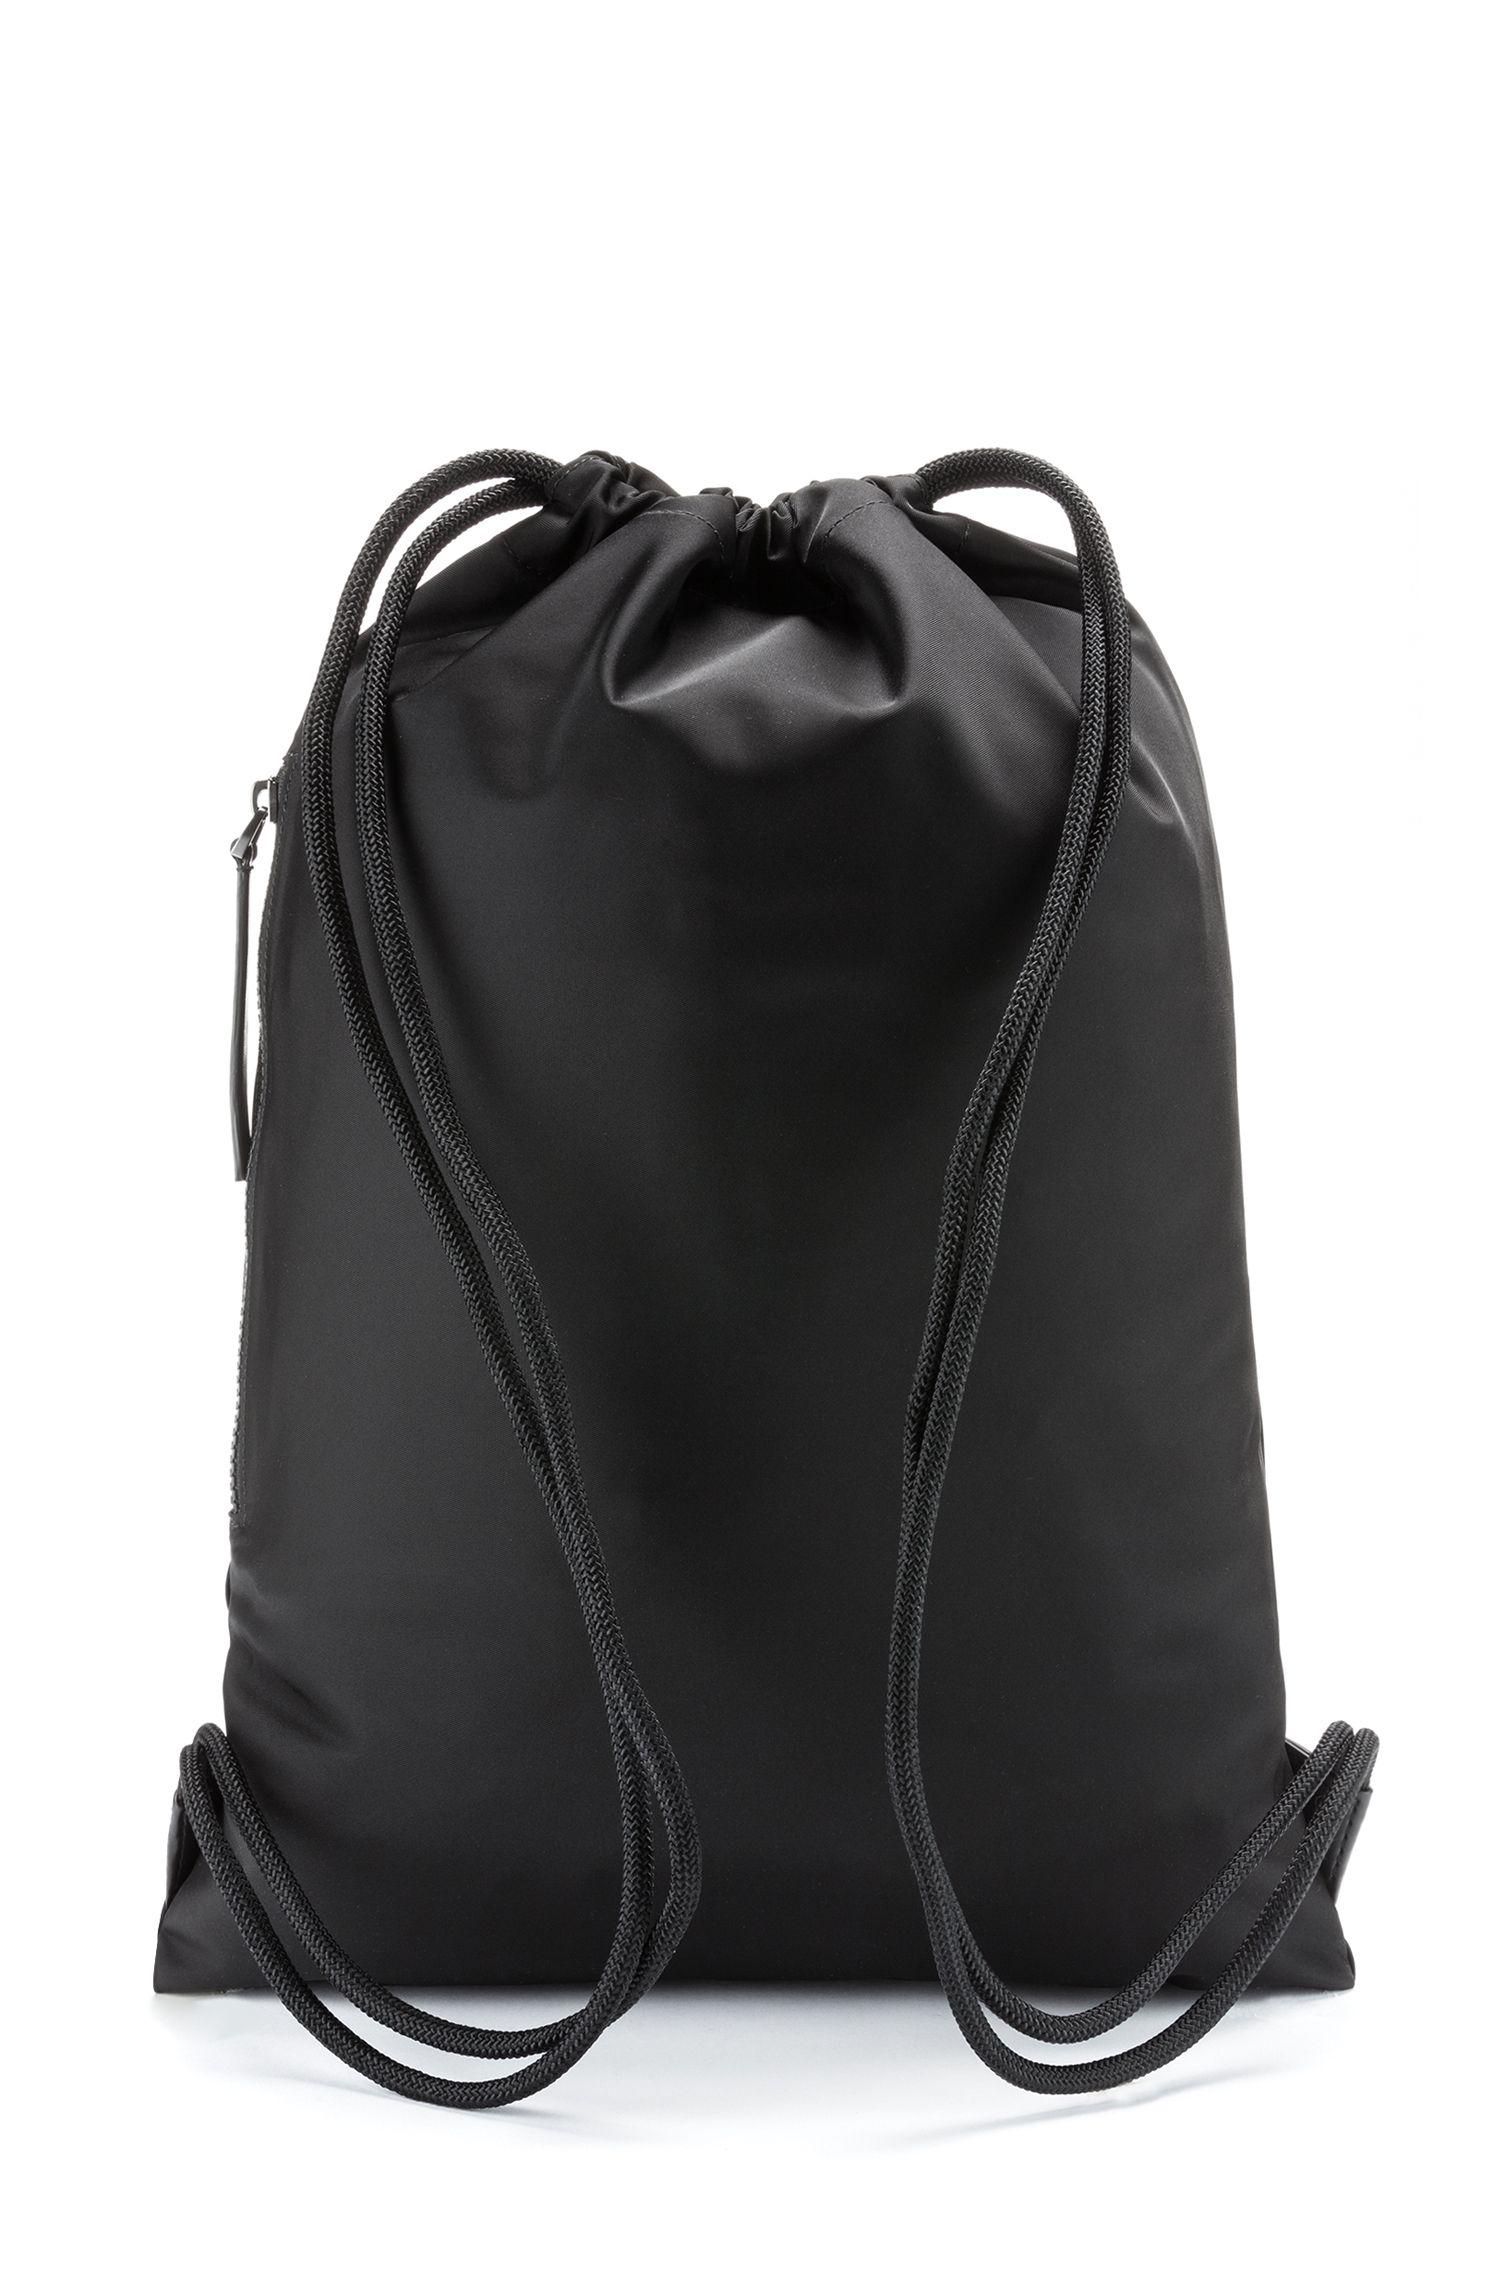 Hugo Boss - Mochila de cordones en tejido de gabardina de nylon con logo invertido - 5